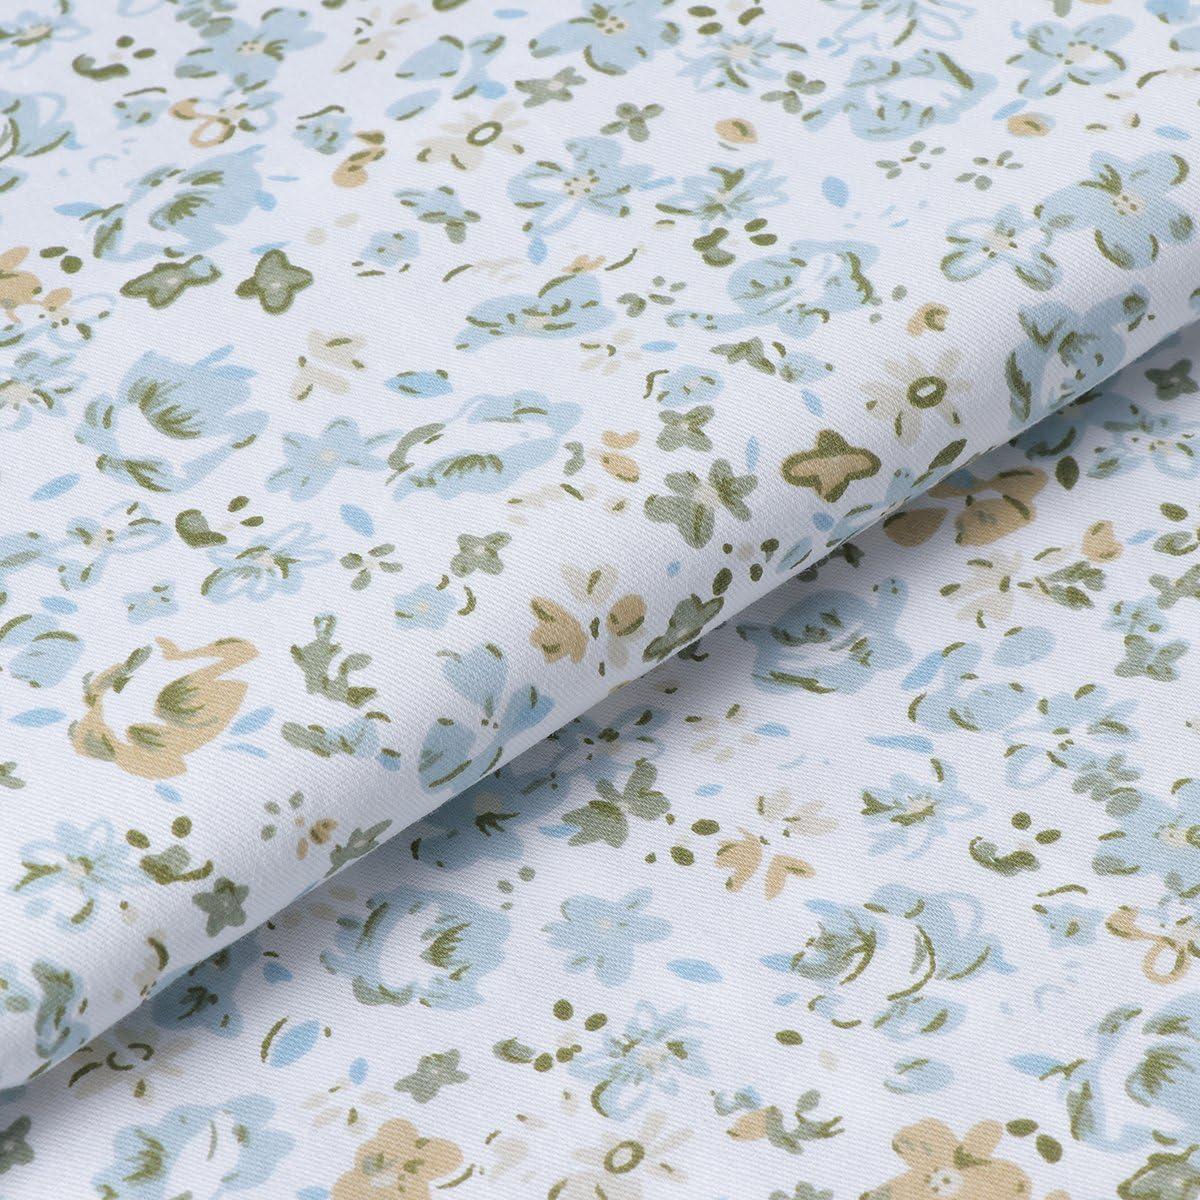 Healifty 7pcs Quadrate Bundle Floral Cotton Craft Stoff f/ür Patchwork DIY N/ähen Scrapbooking Quilten 50 x 50 cm grau